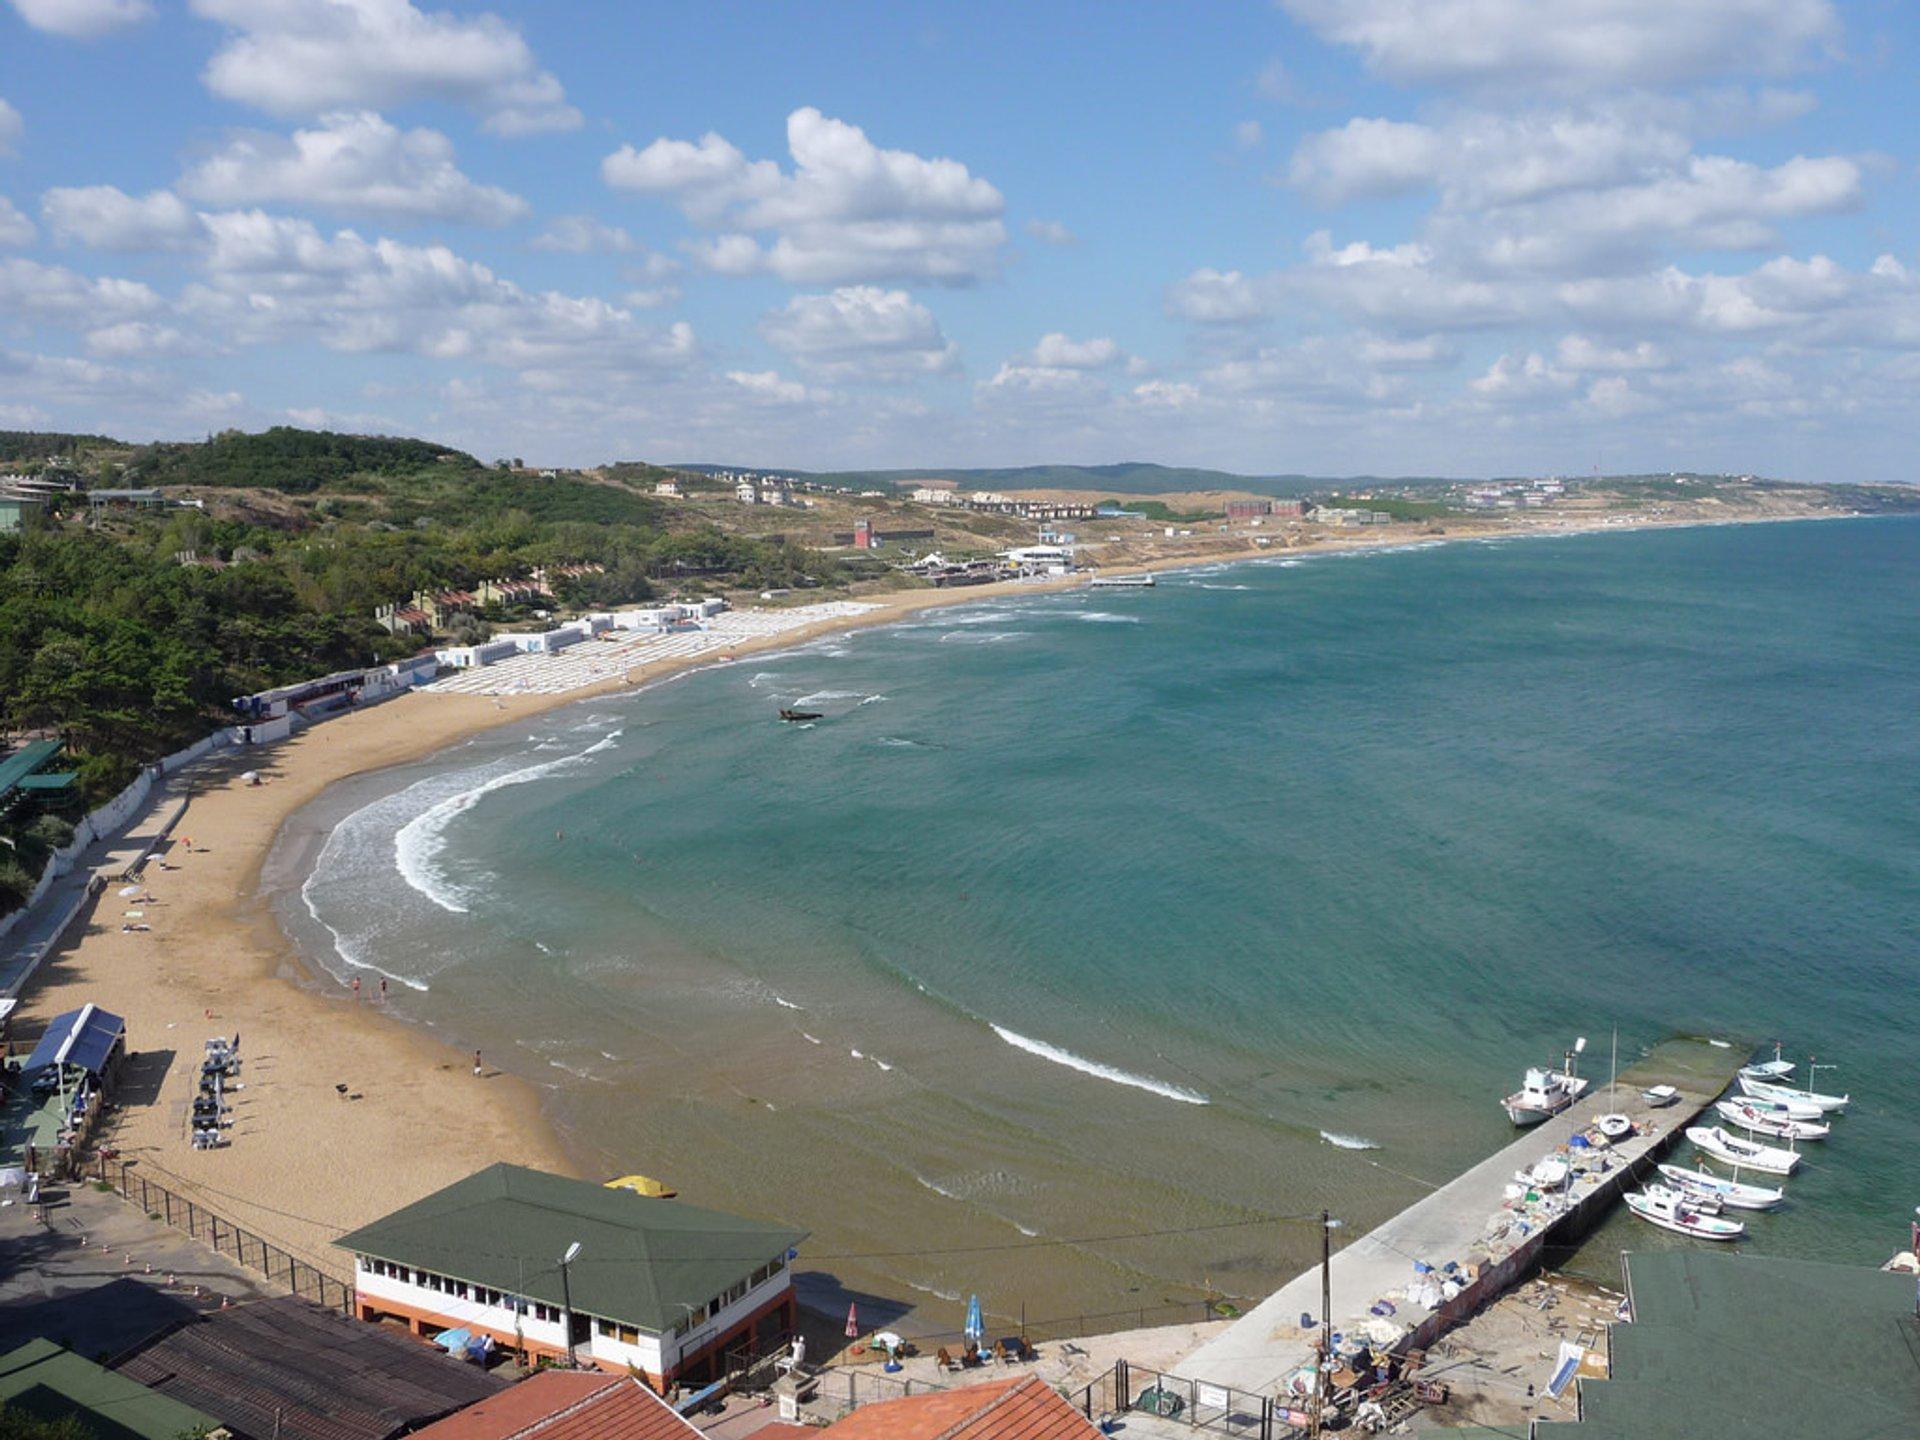 Kylios beach view 2020